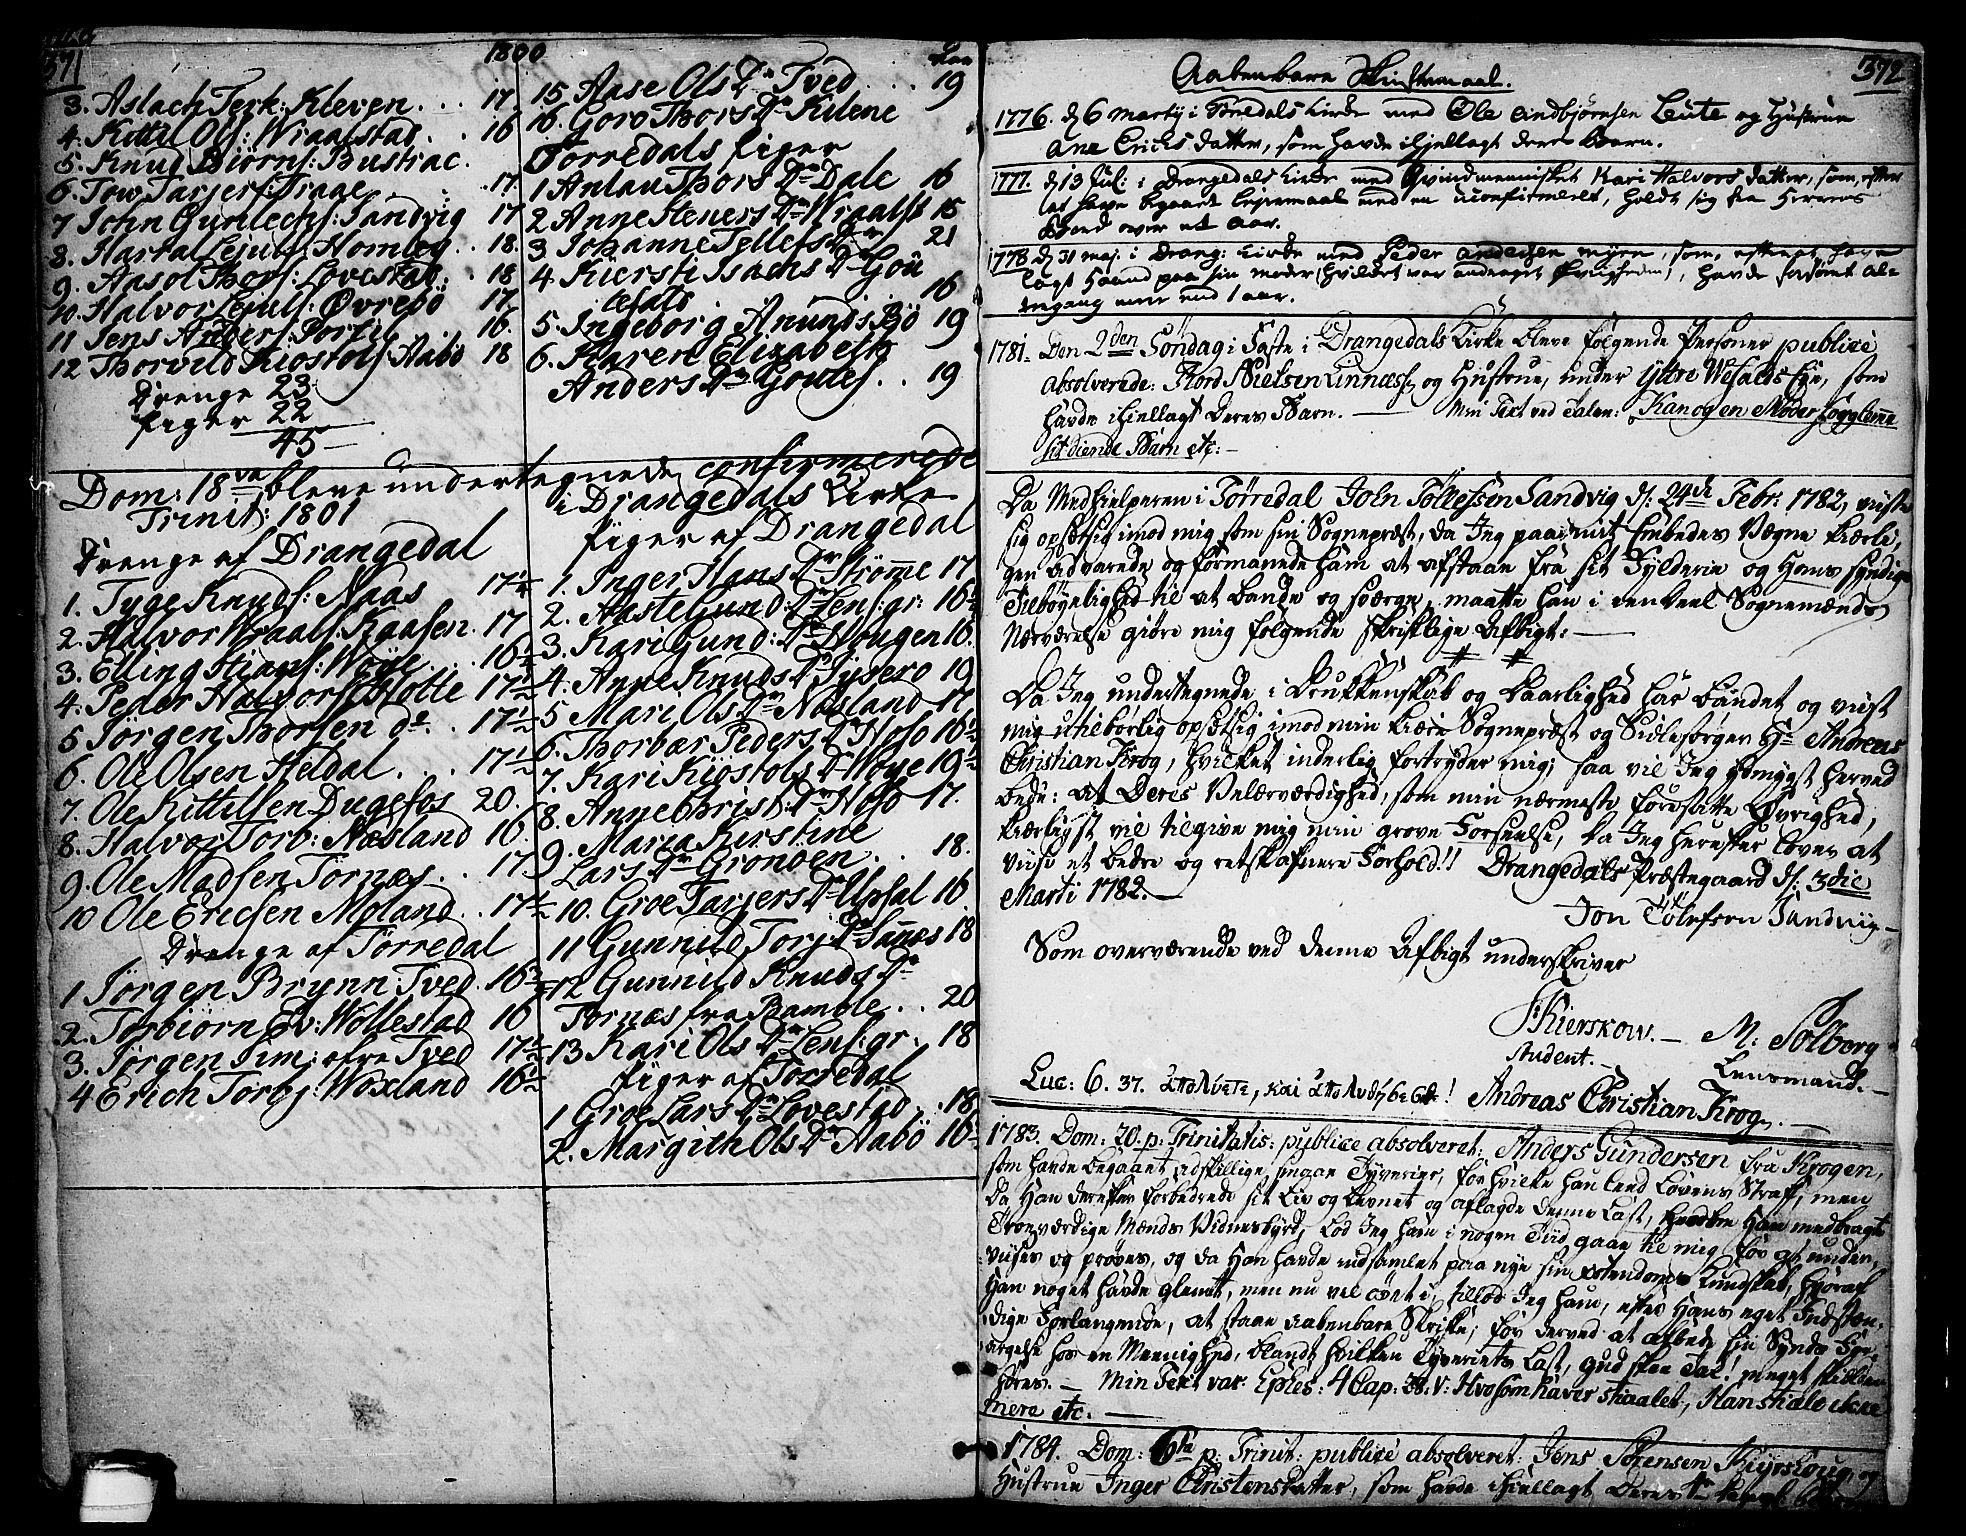 SAKO, Drangedal kirkebøker, F/Fa/L0003: Ministerialbok nr. 3, 1768-1814, s. 371-372